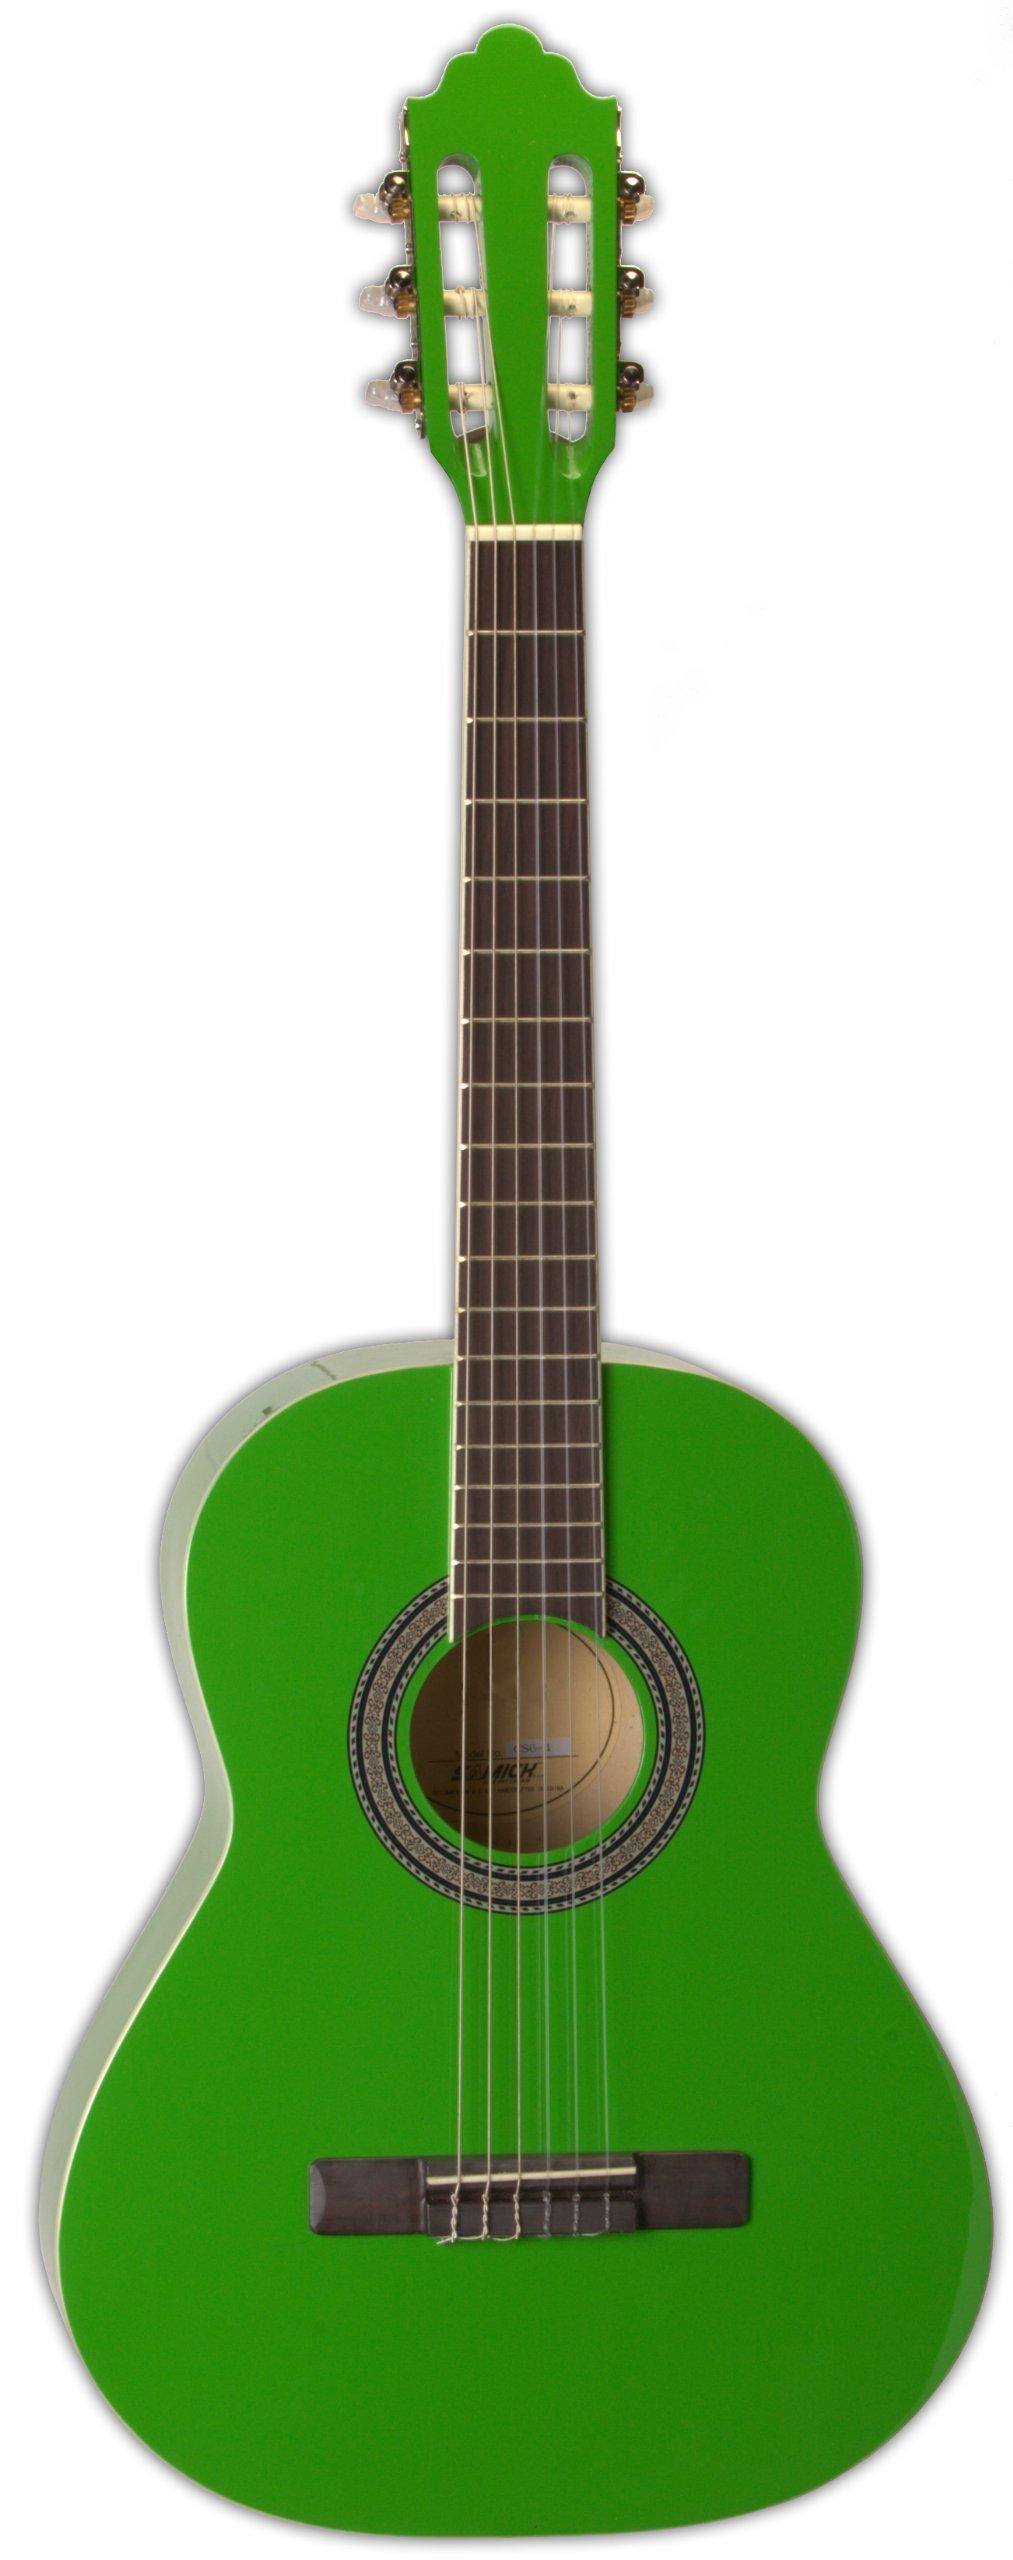 San Mateo San Mateo SCS6 GRN 36-Inch Classical Guitar, Green by San Mateo